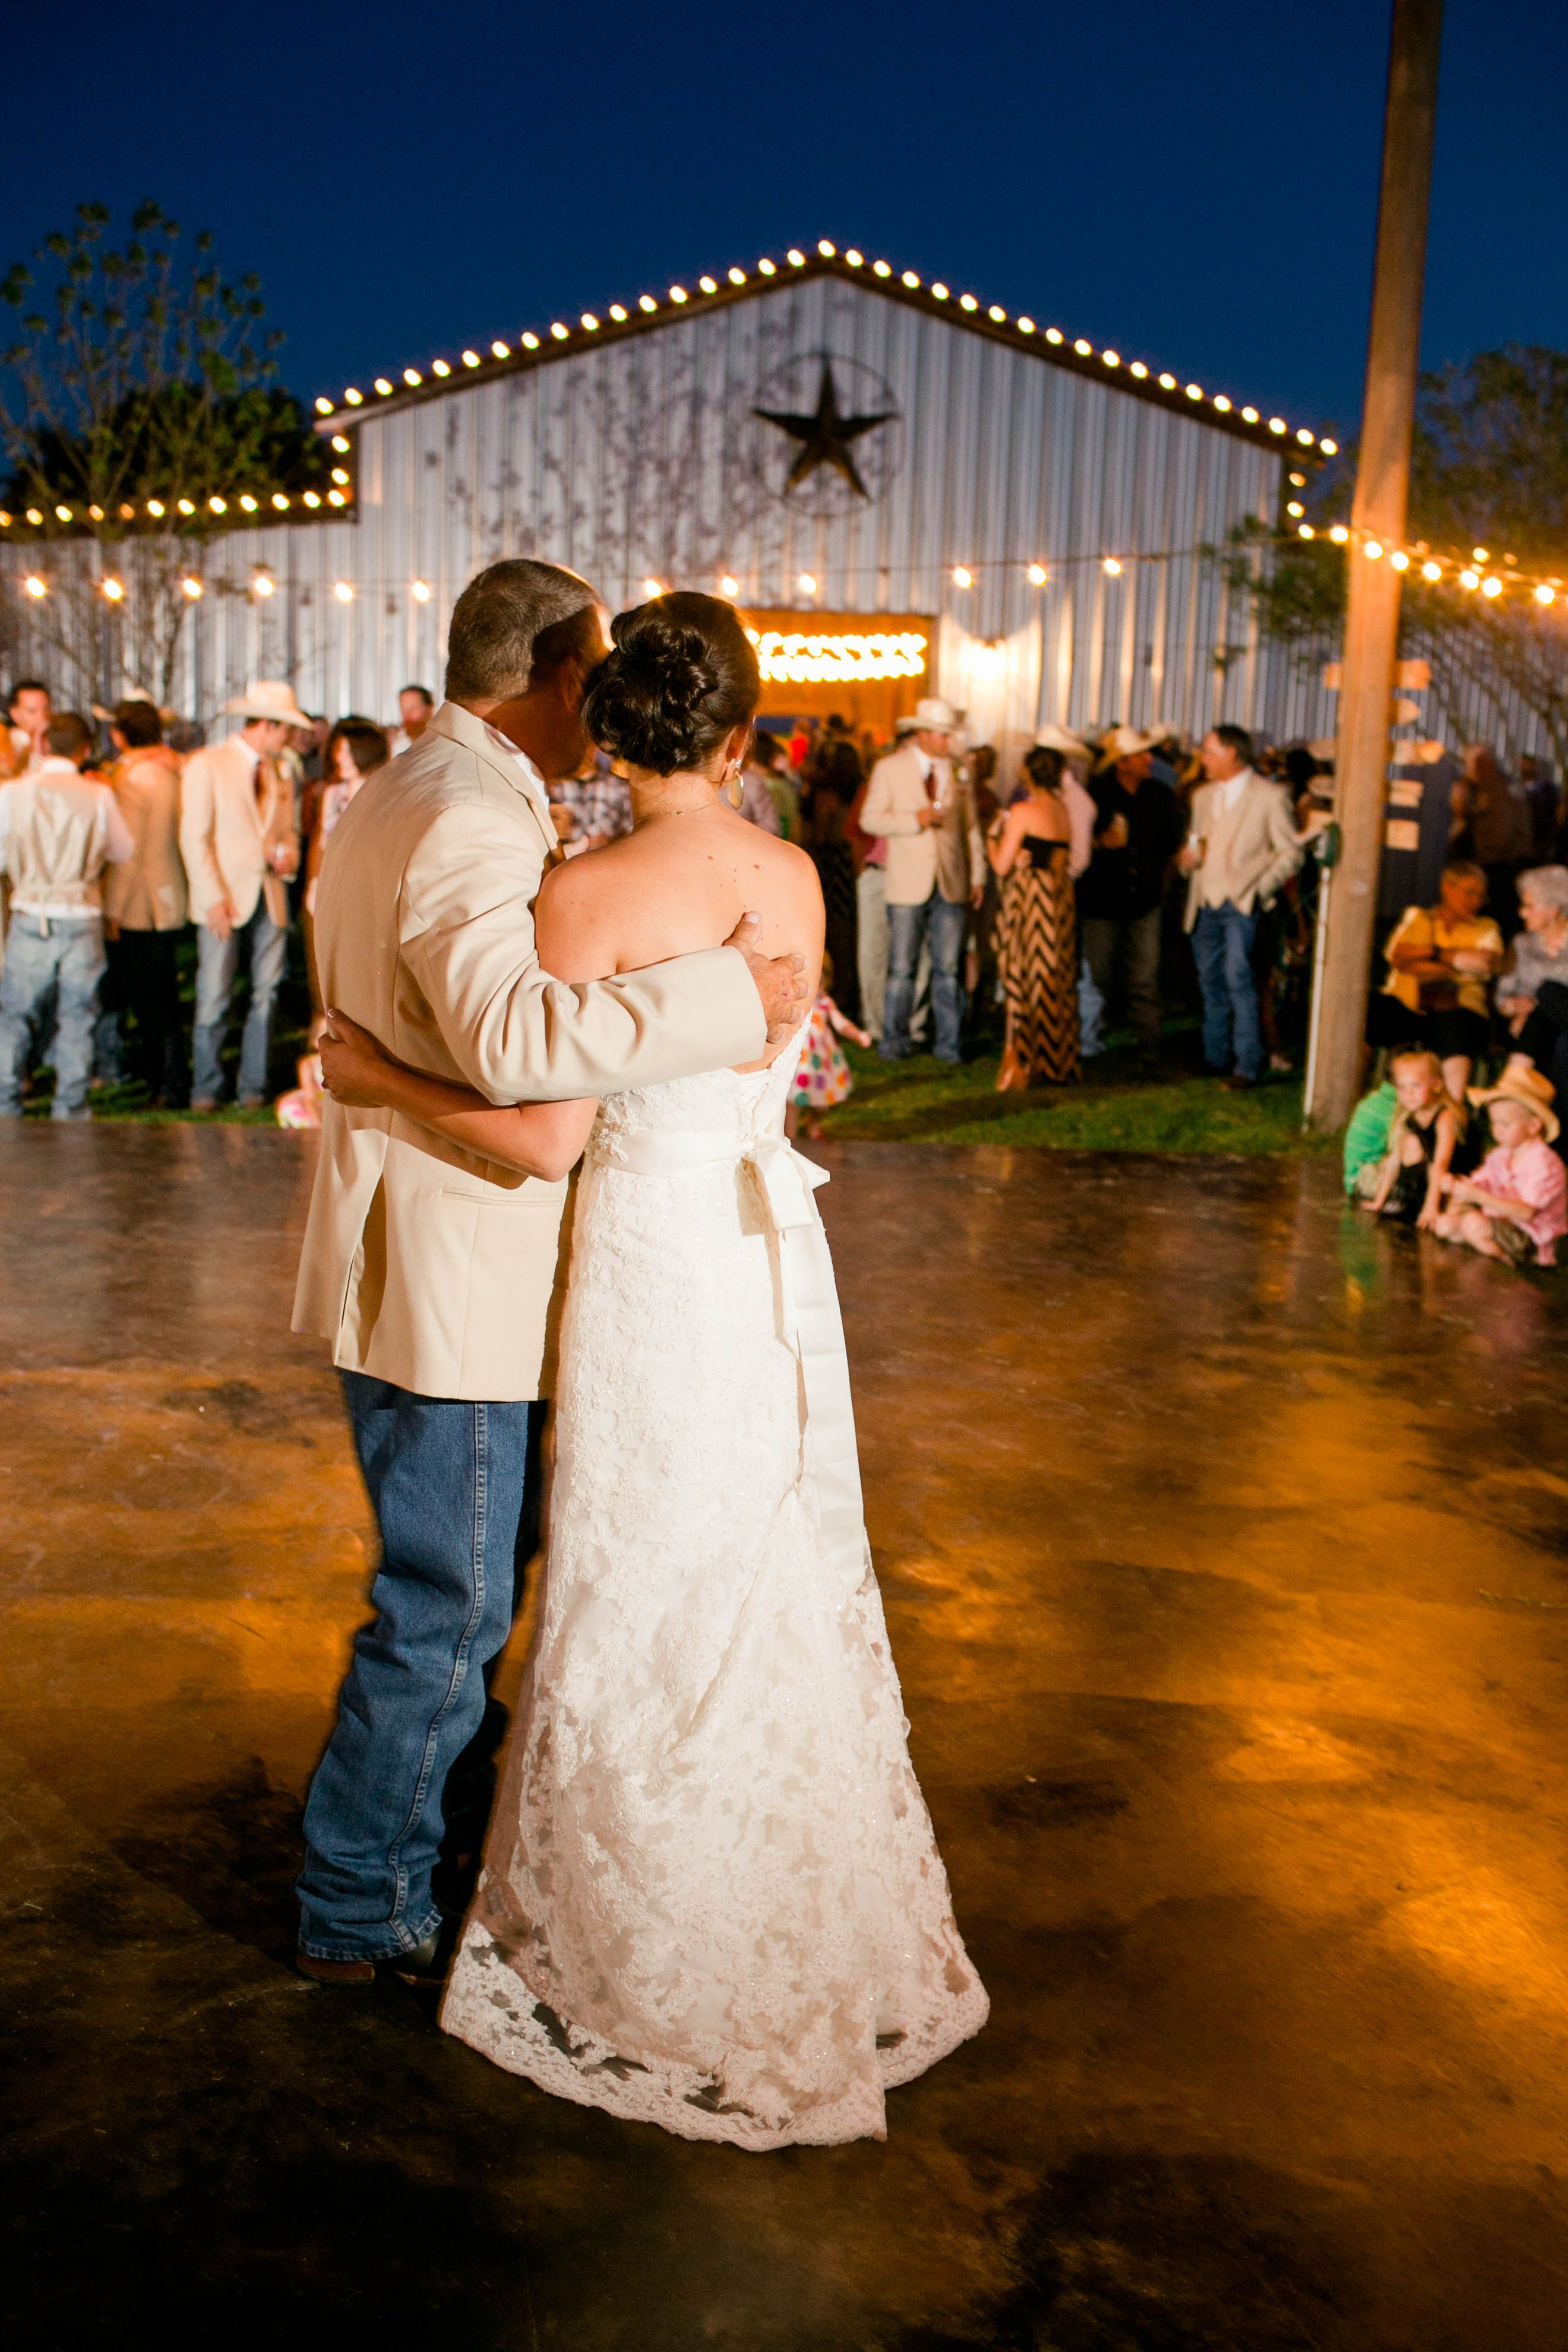 Wied wedding at cotton creek lubbock tx cotton creek weddings wied wedding at cotton creek lubbock tx ombrellifo Images